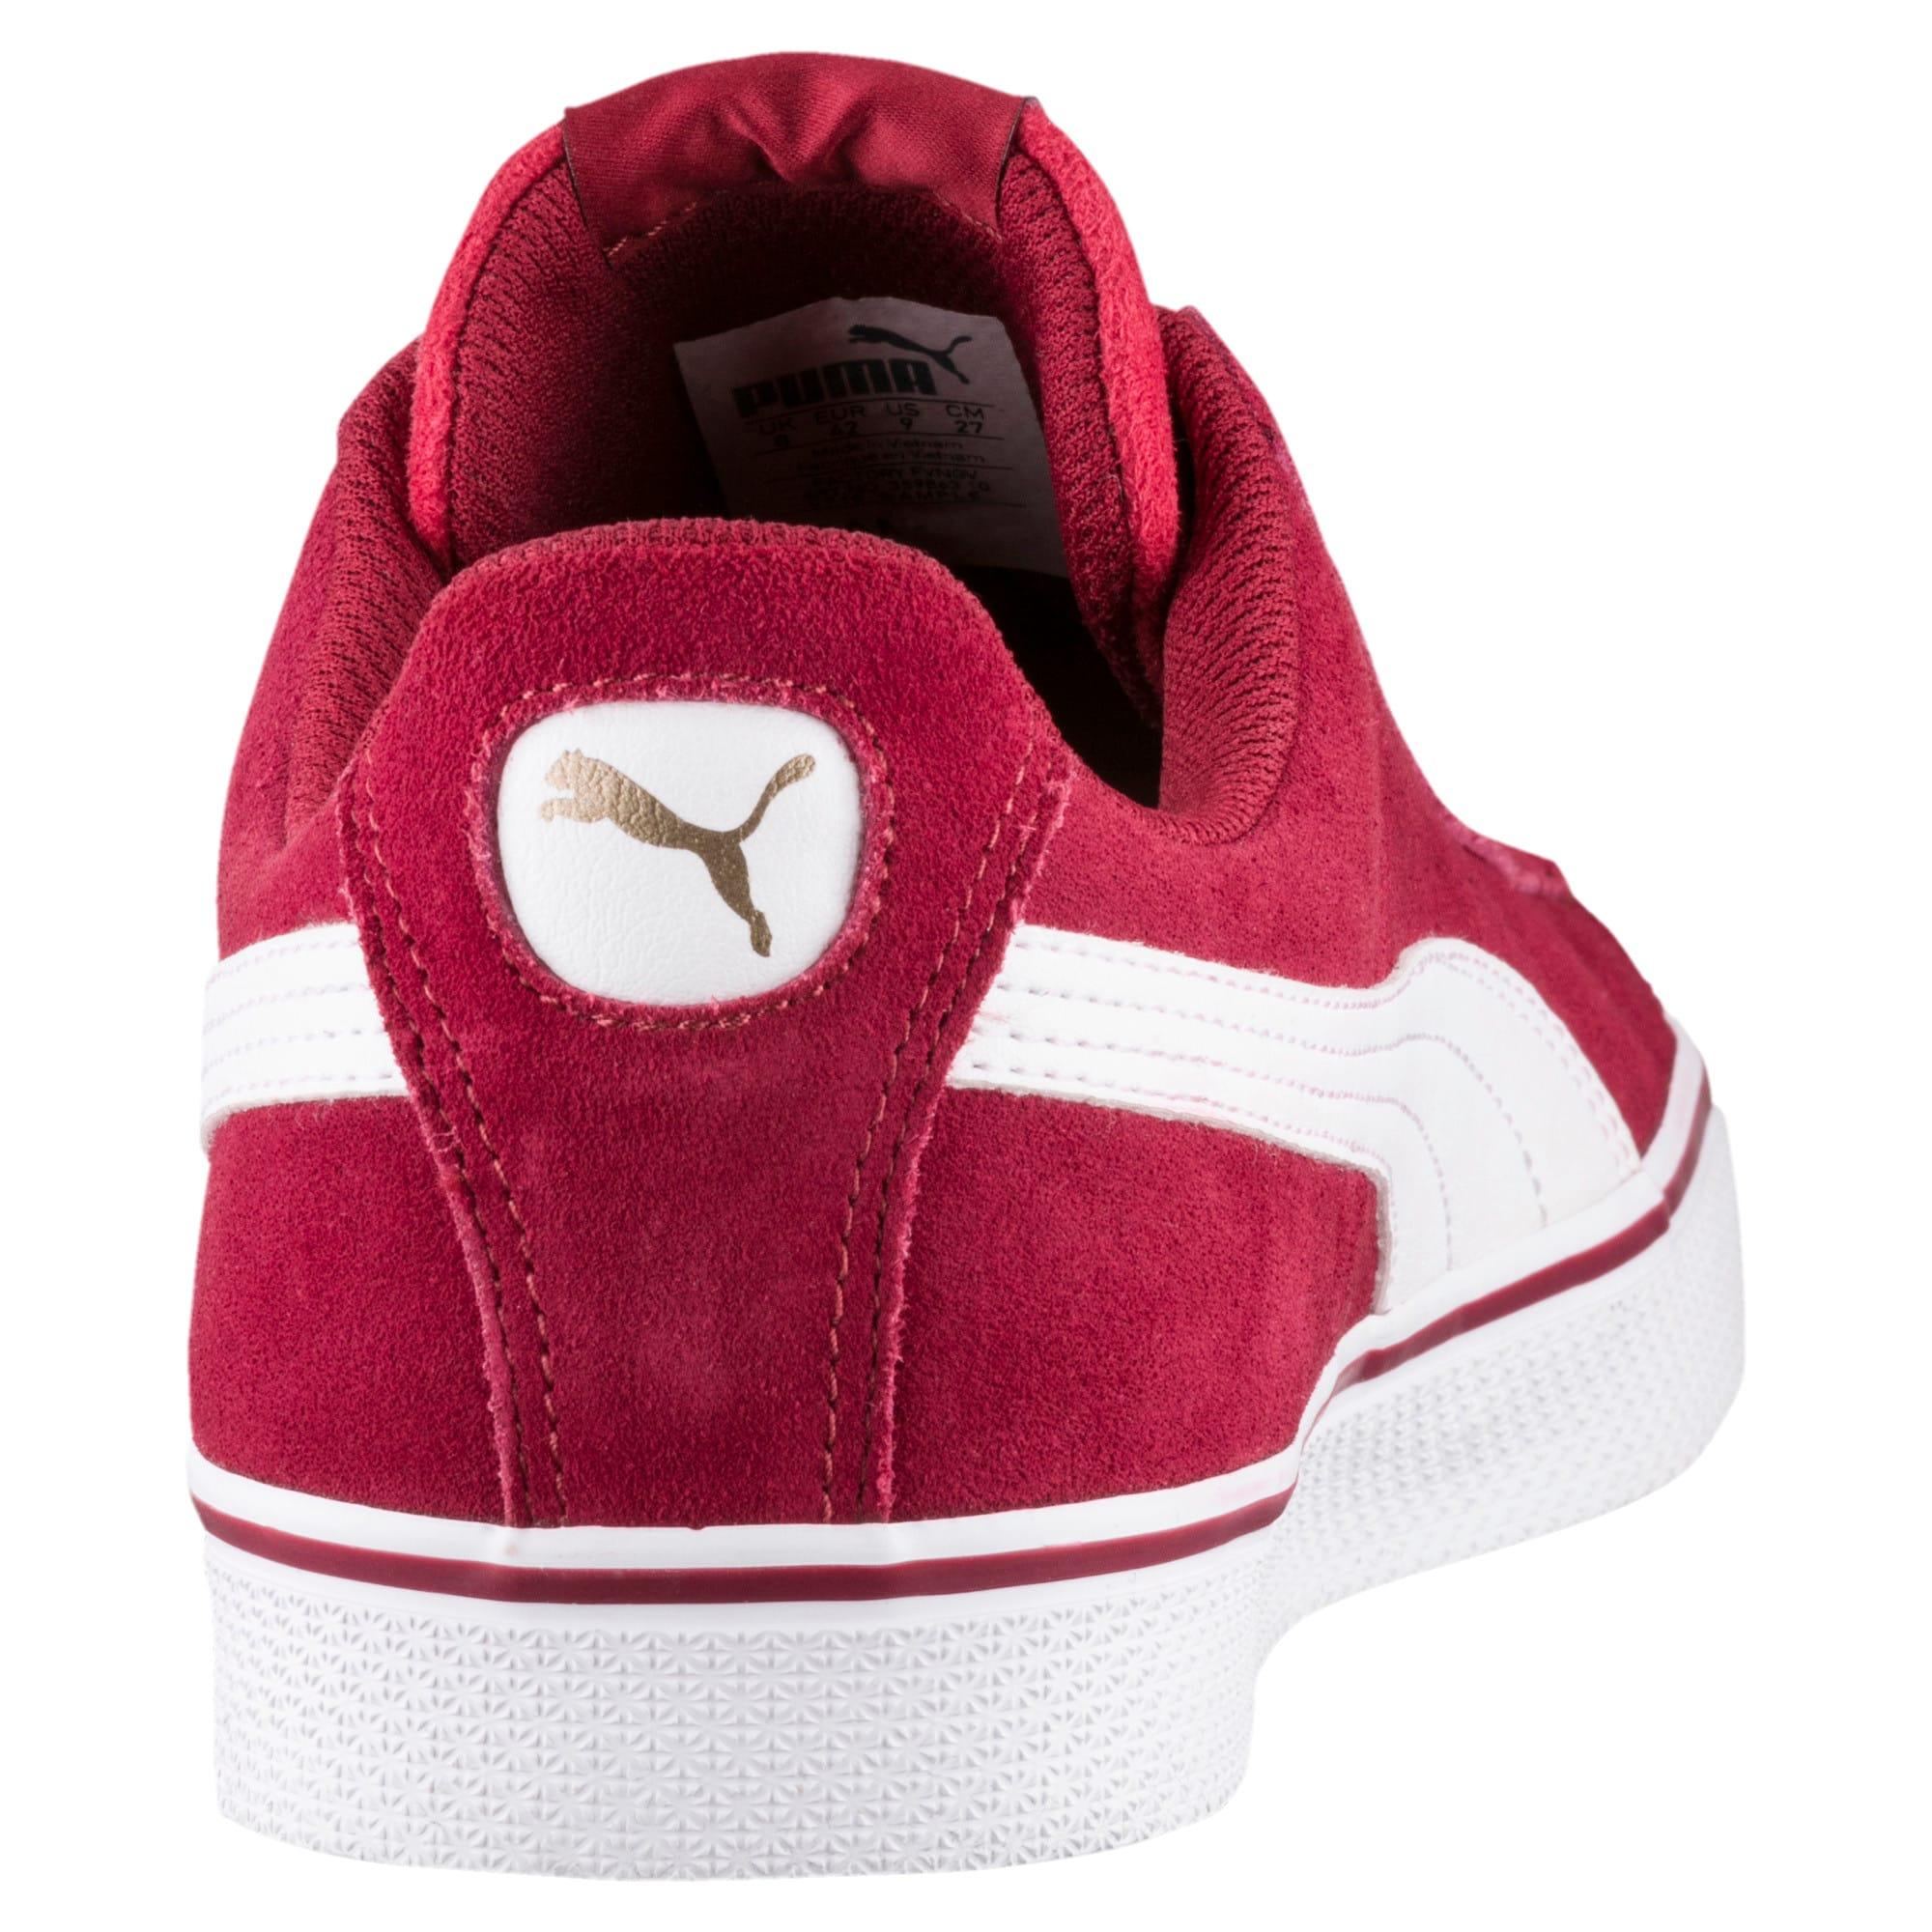 Thumbnail 4 of PUMA 1948 Vulc Men's Sneakers, Tibetan Red-Puma White, medium